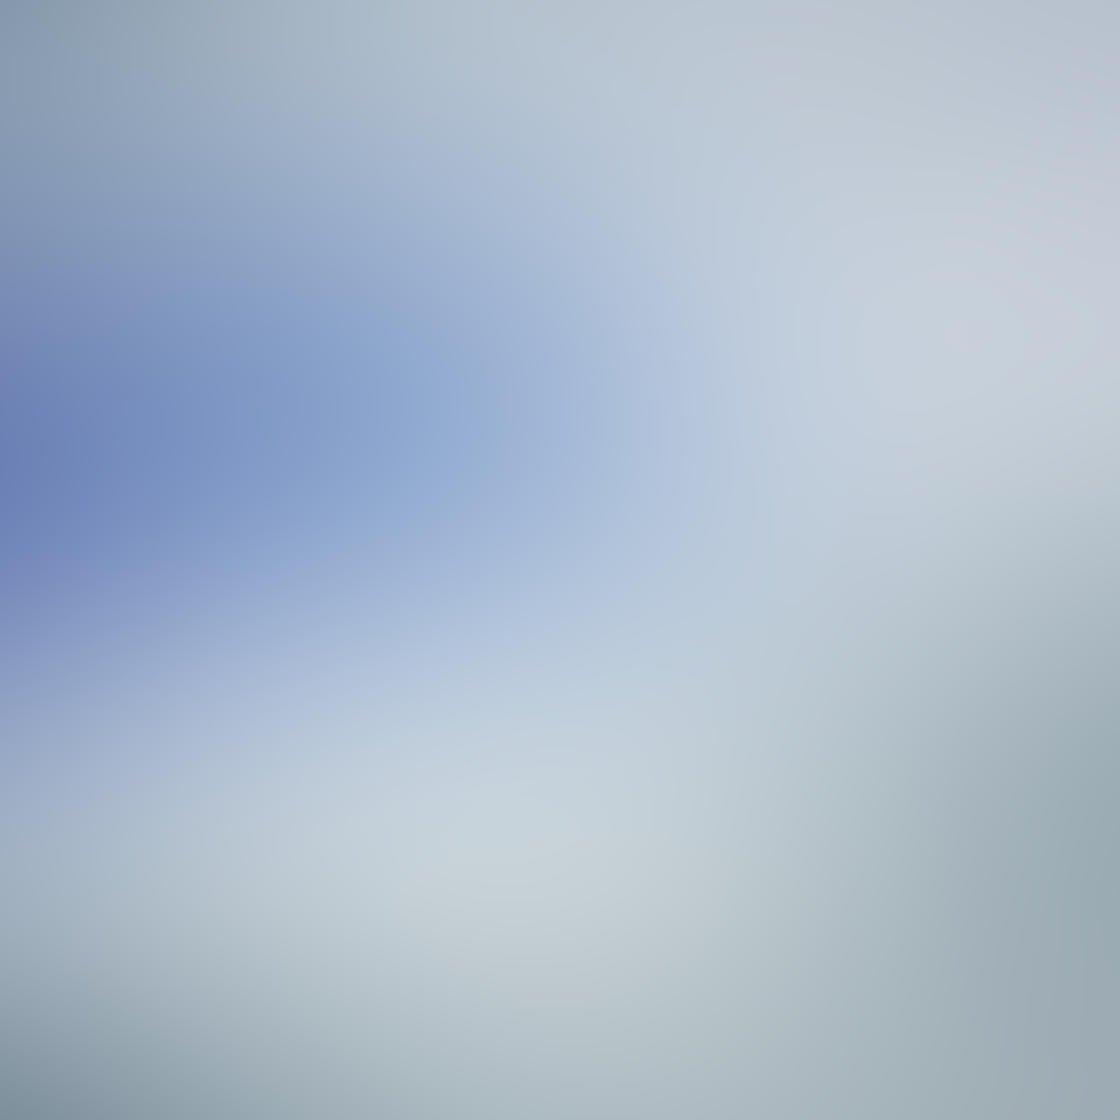 iPhone Photo Vignette 20